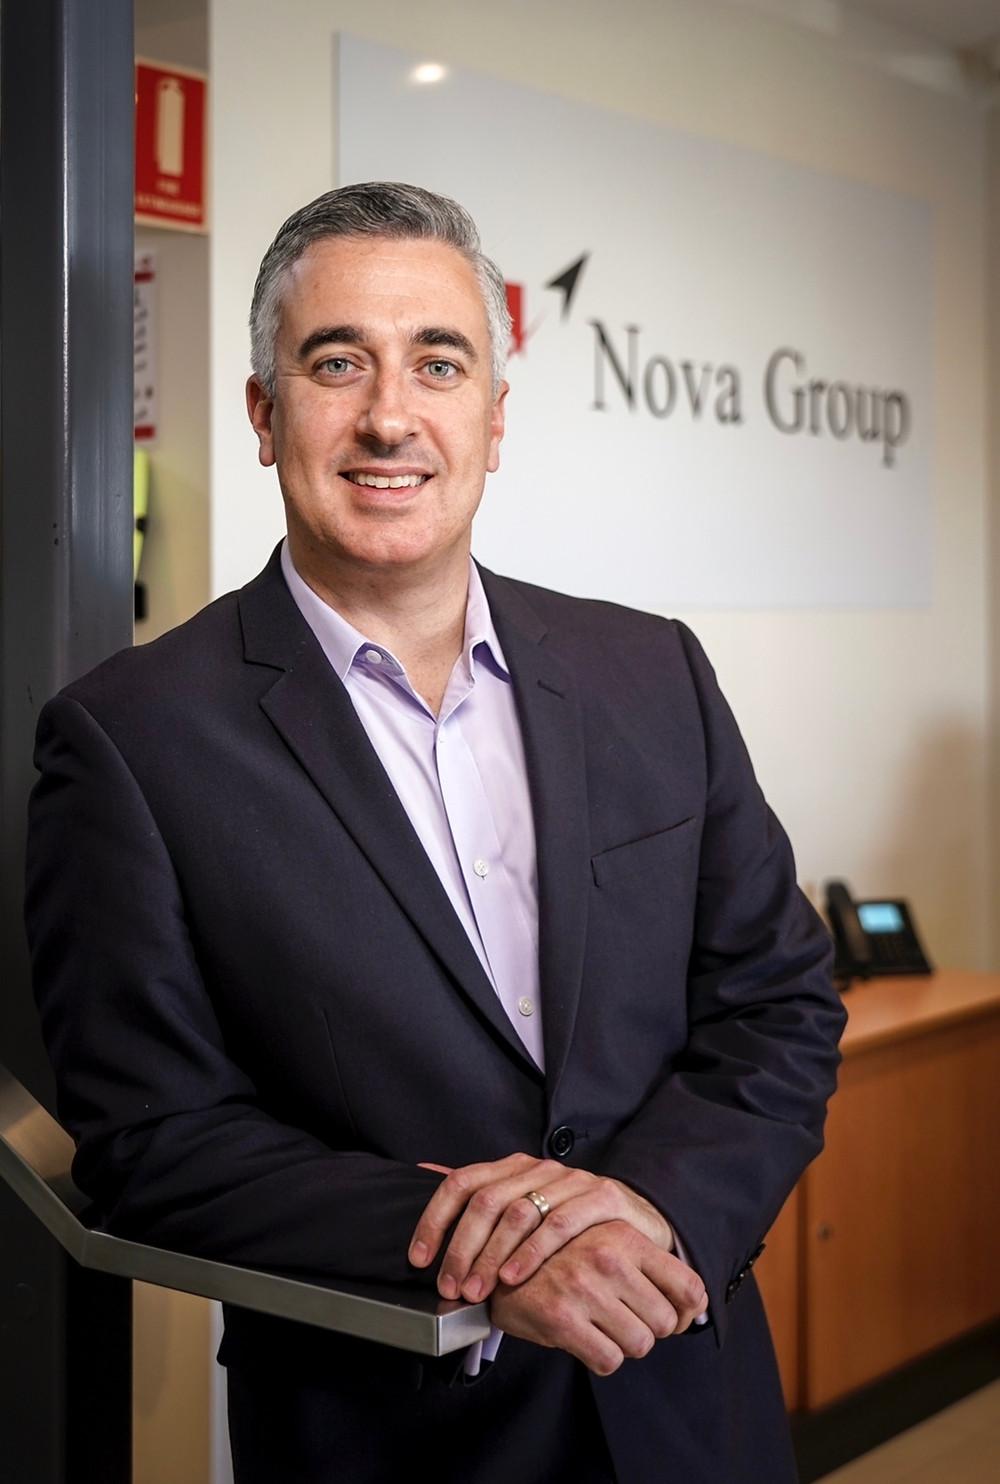 Nova Systems' John Godwin